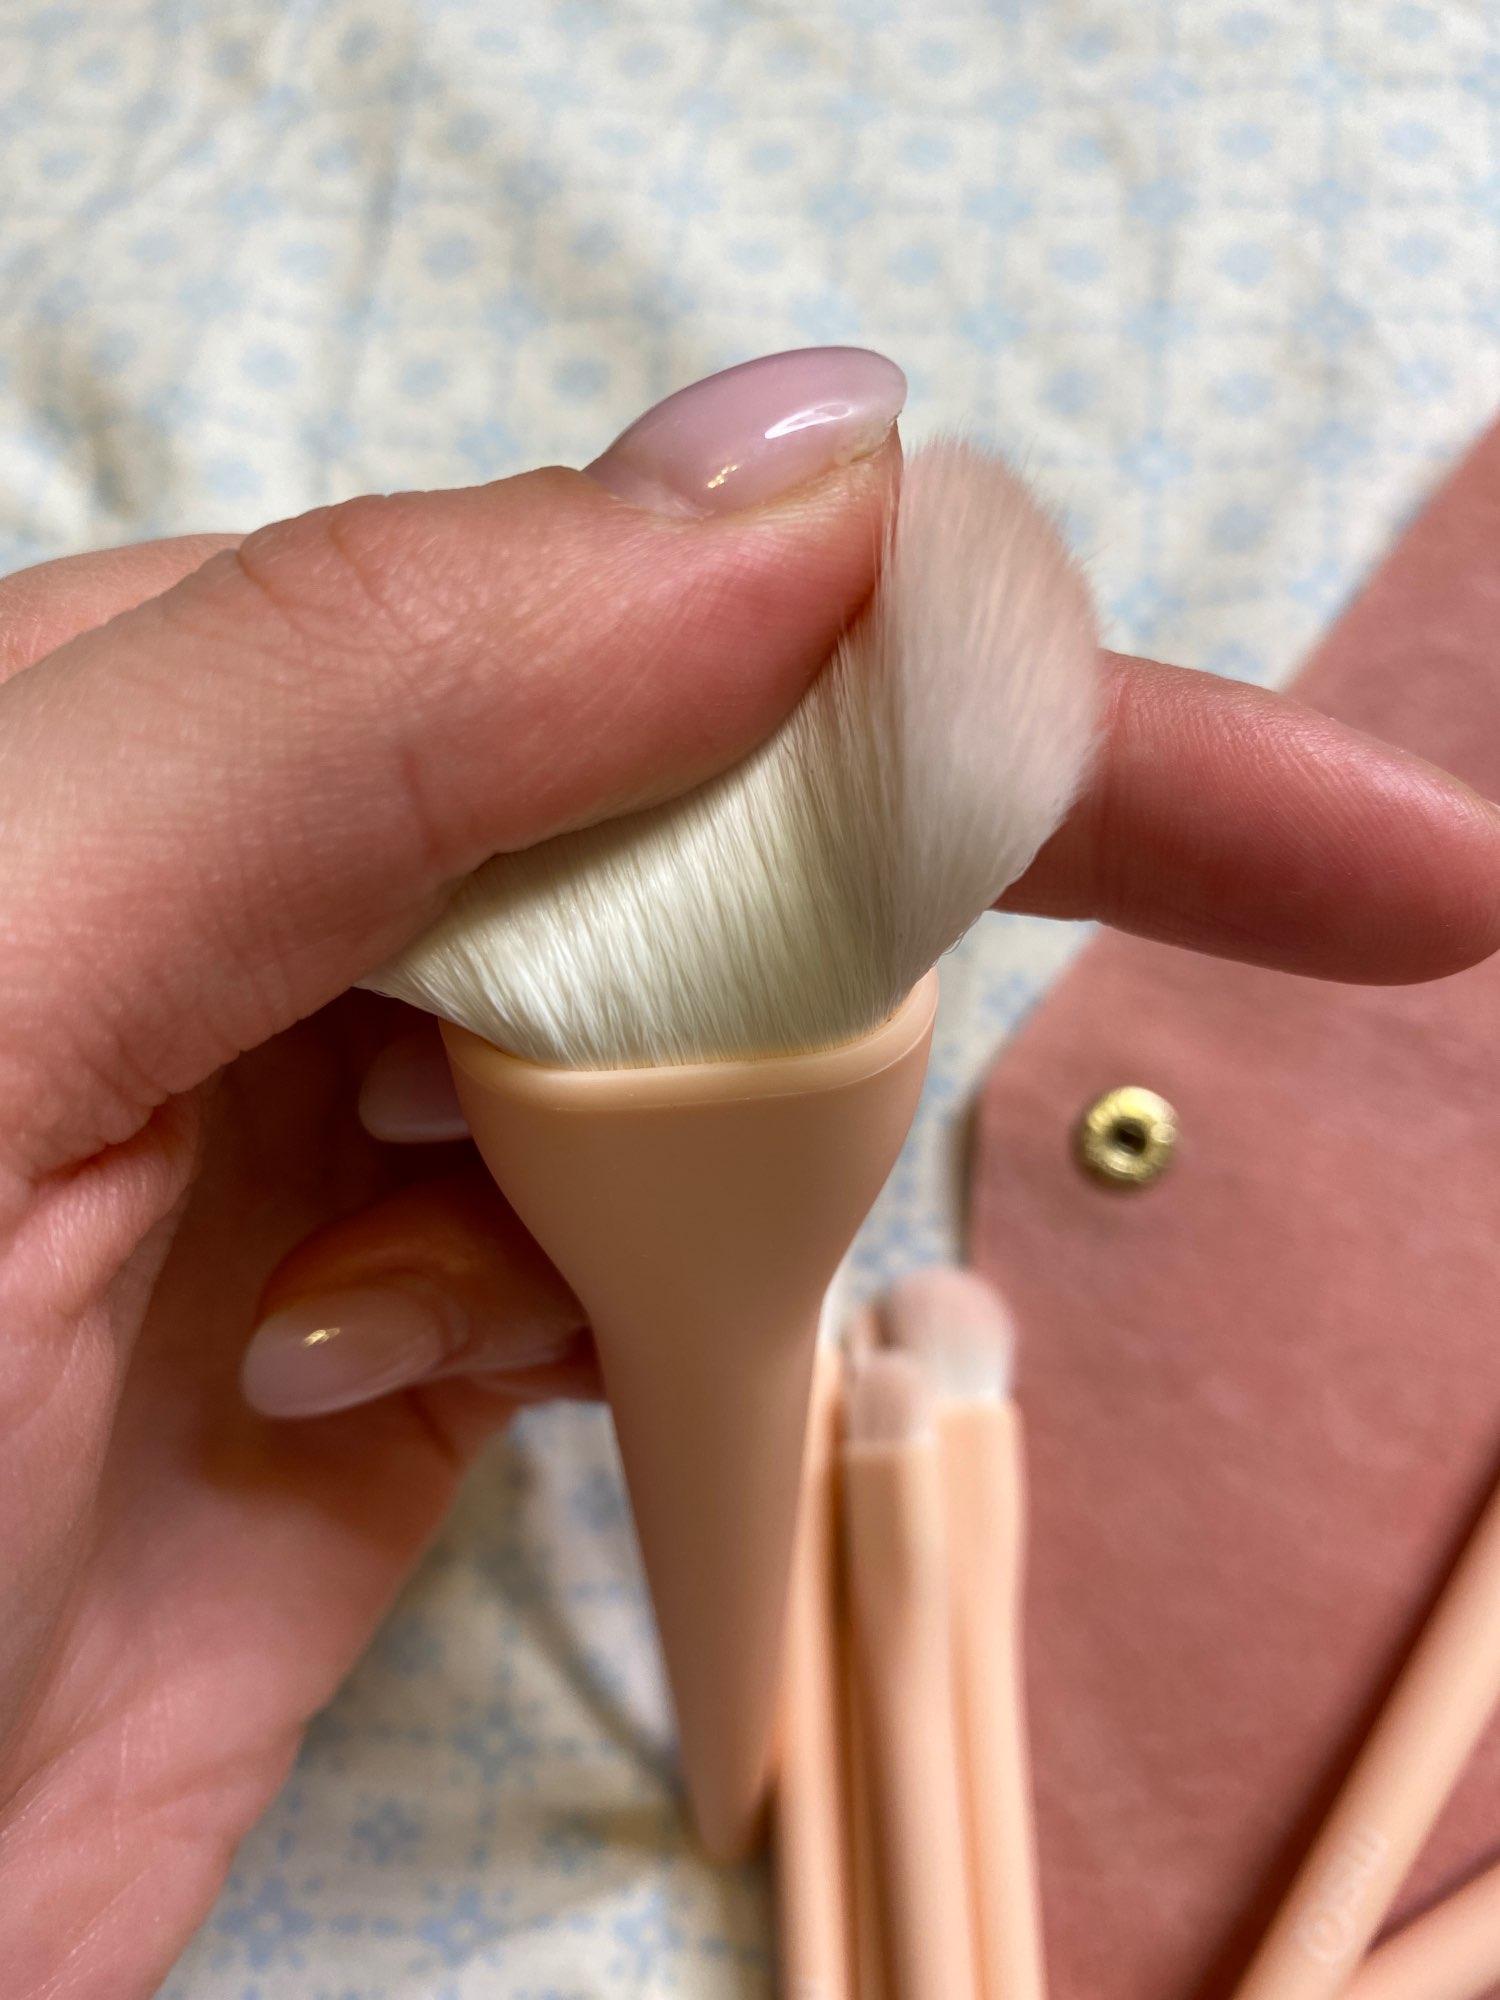 8PCS Makeup Brushes Sets Powder Foundation Blusher Eyeshadow Brush Candy Cosmetic Colorful Make Up NO MSQ LOGO With Bag reviews №4 223980